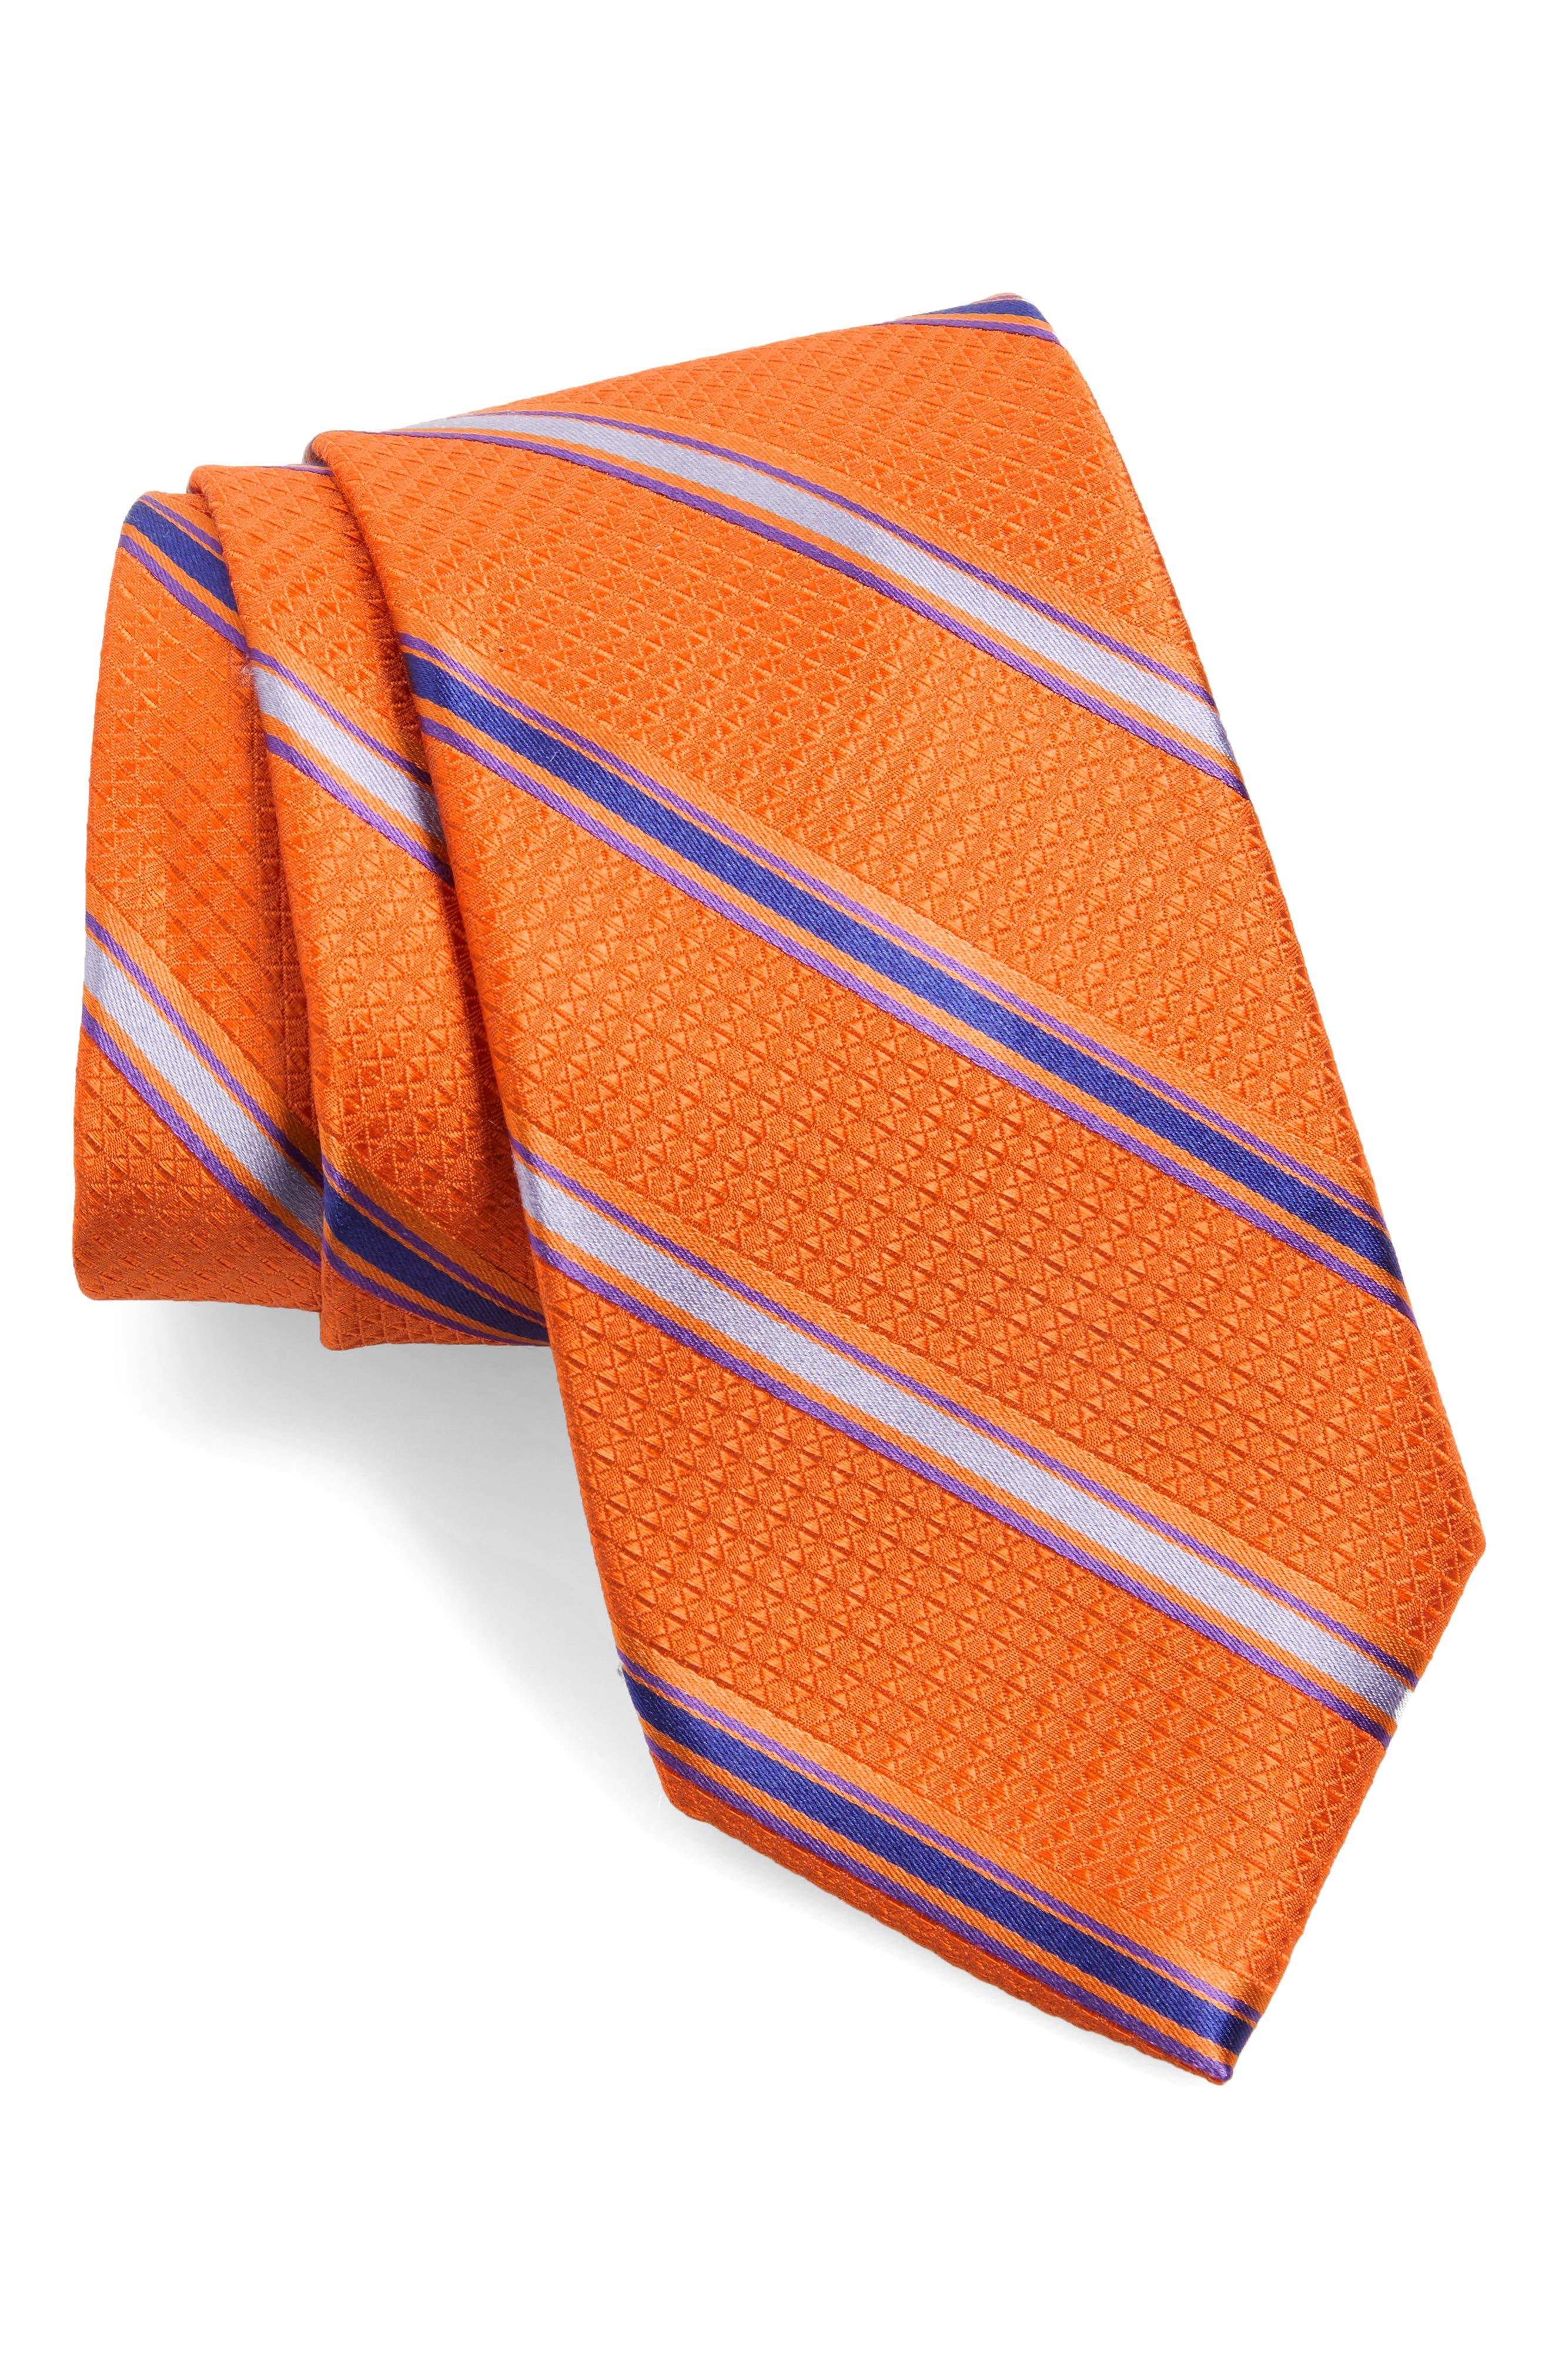 Alternate Image 1 Selected - Nordstrom Men's Shop Stripe Silk Tie